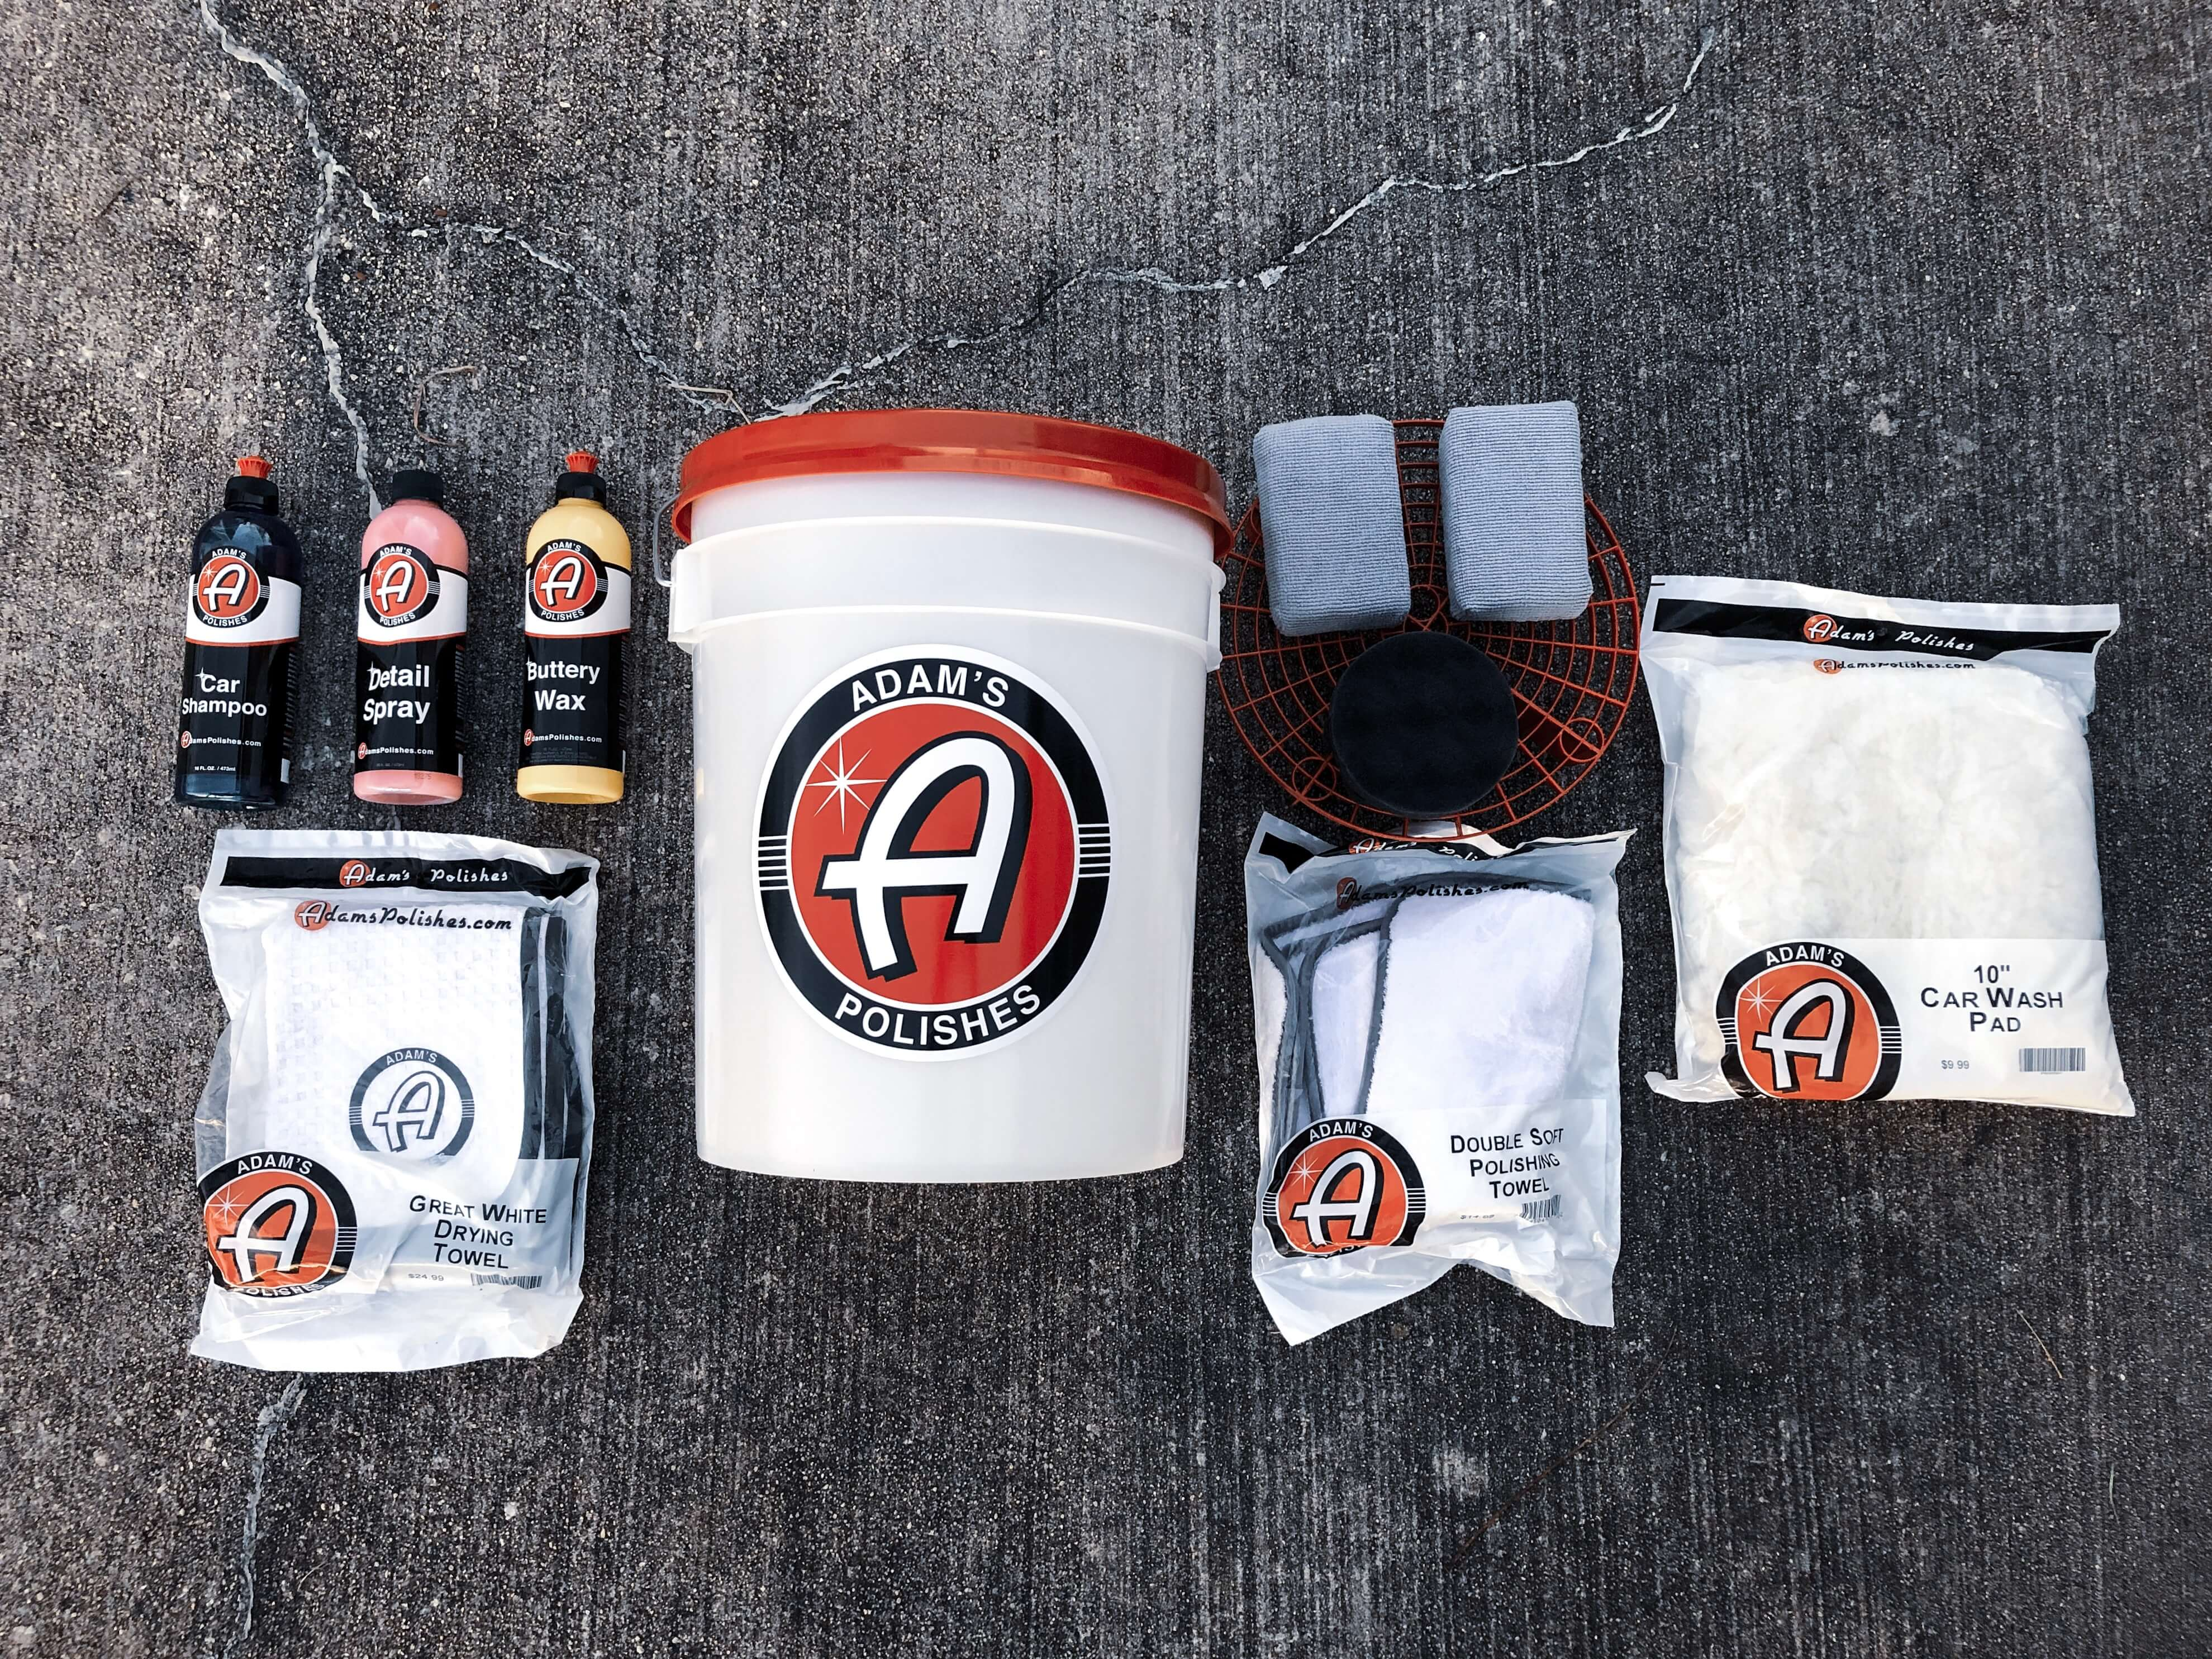 adams polishes car wash kit